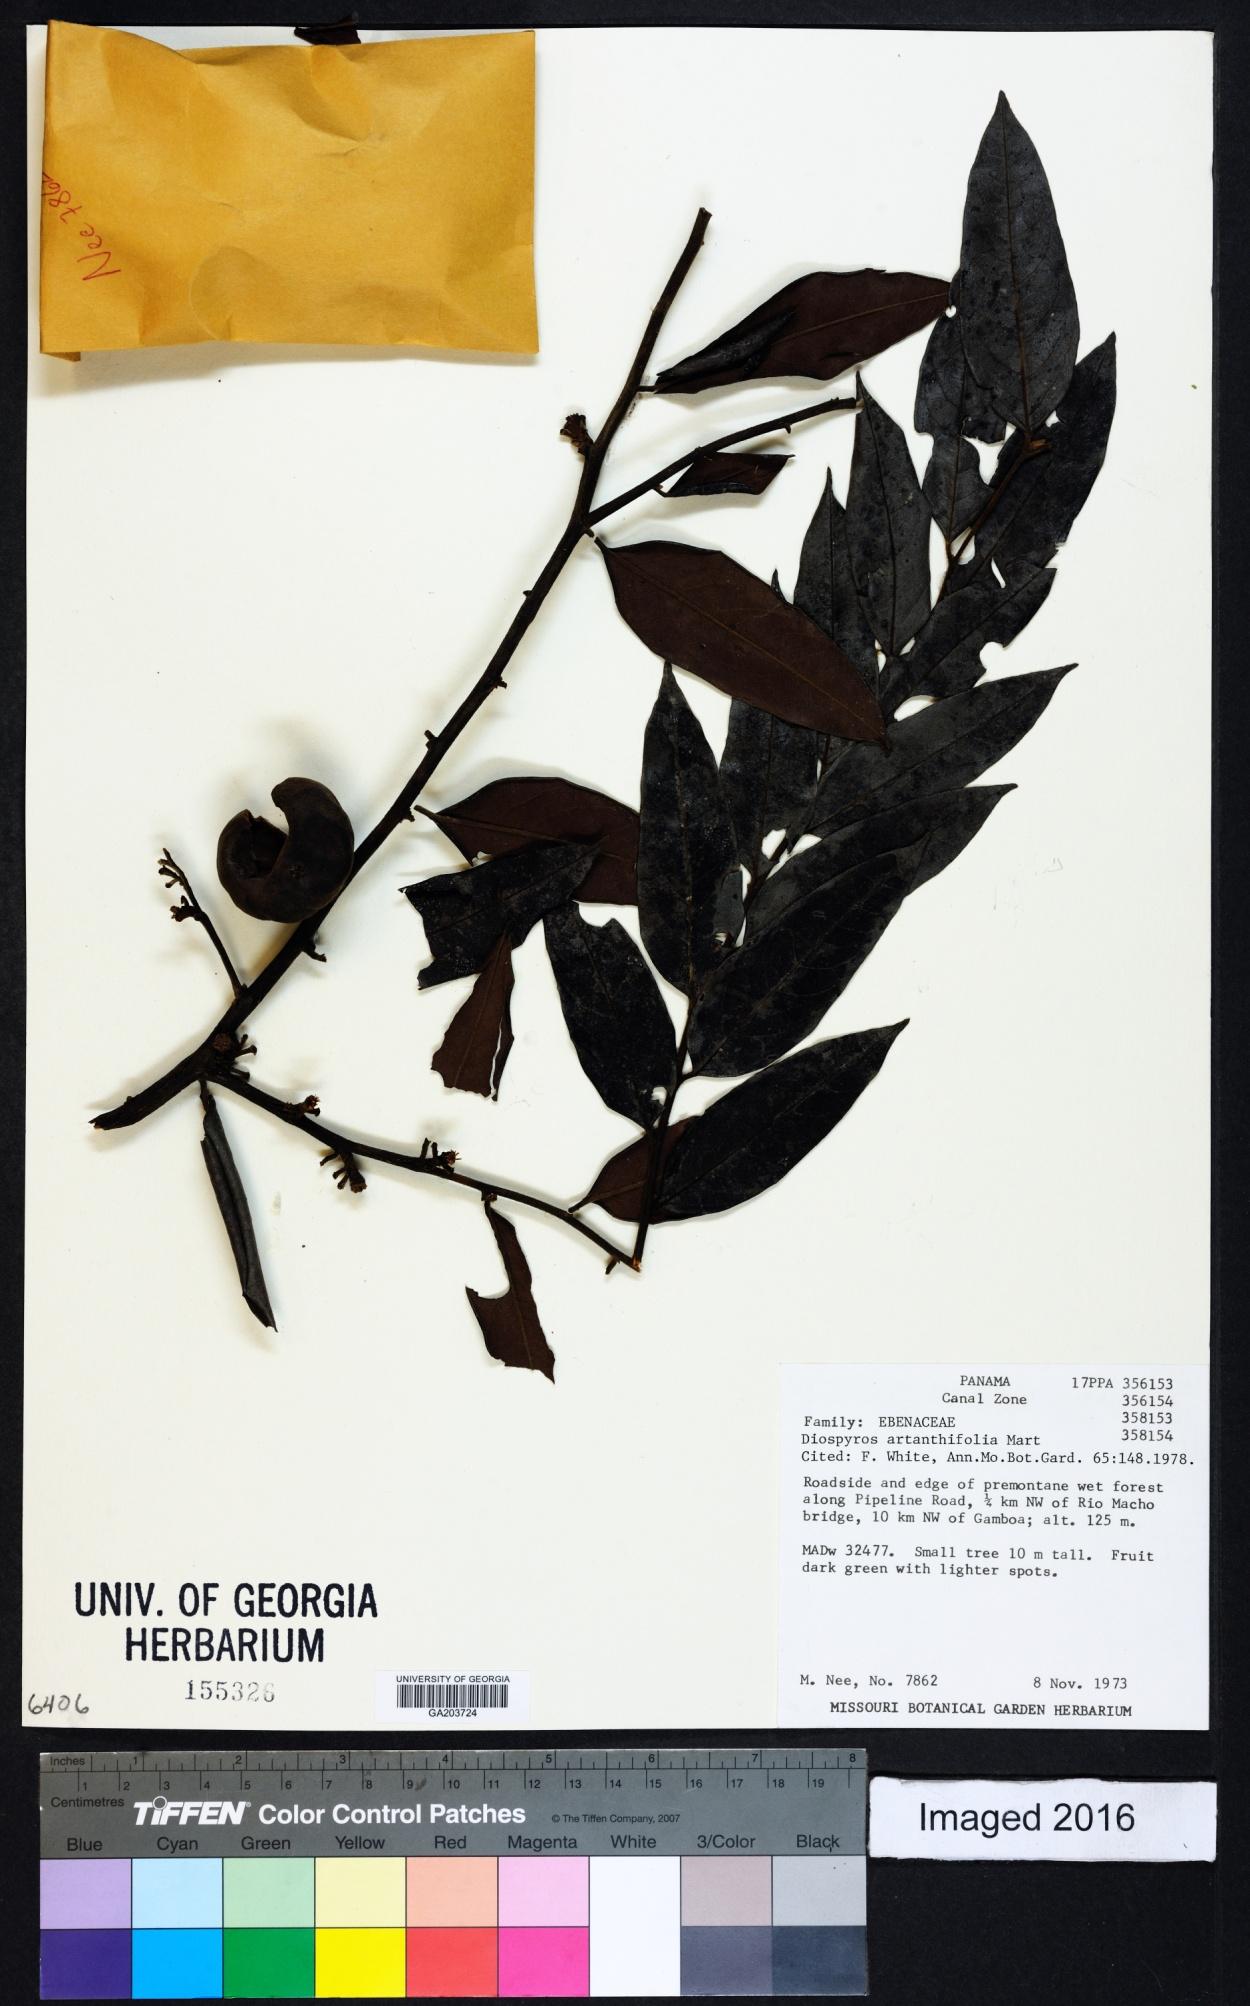 Diospyros artanthifolia image